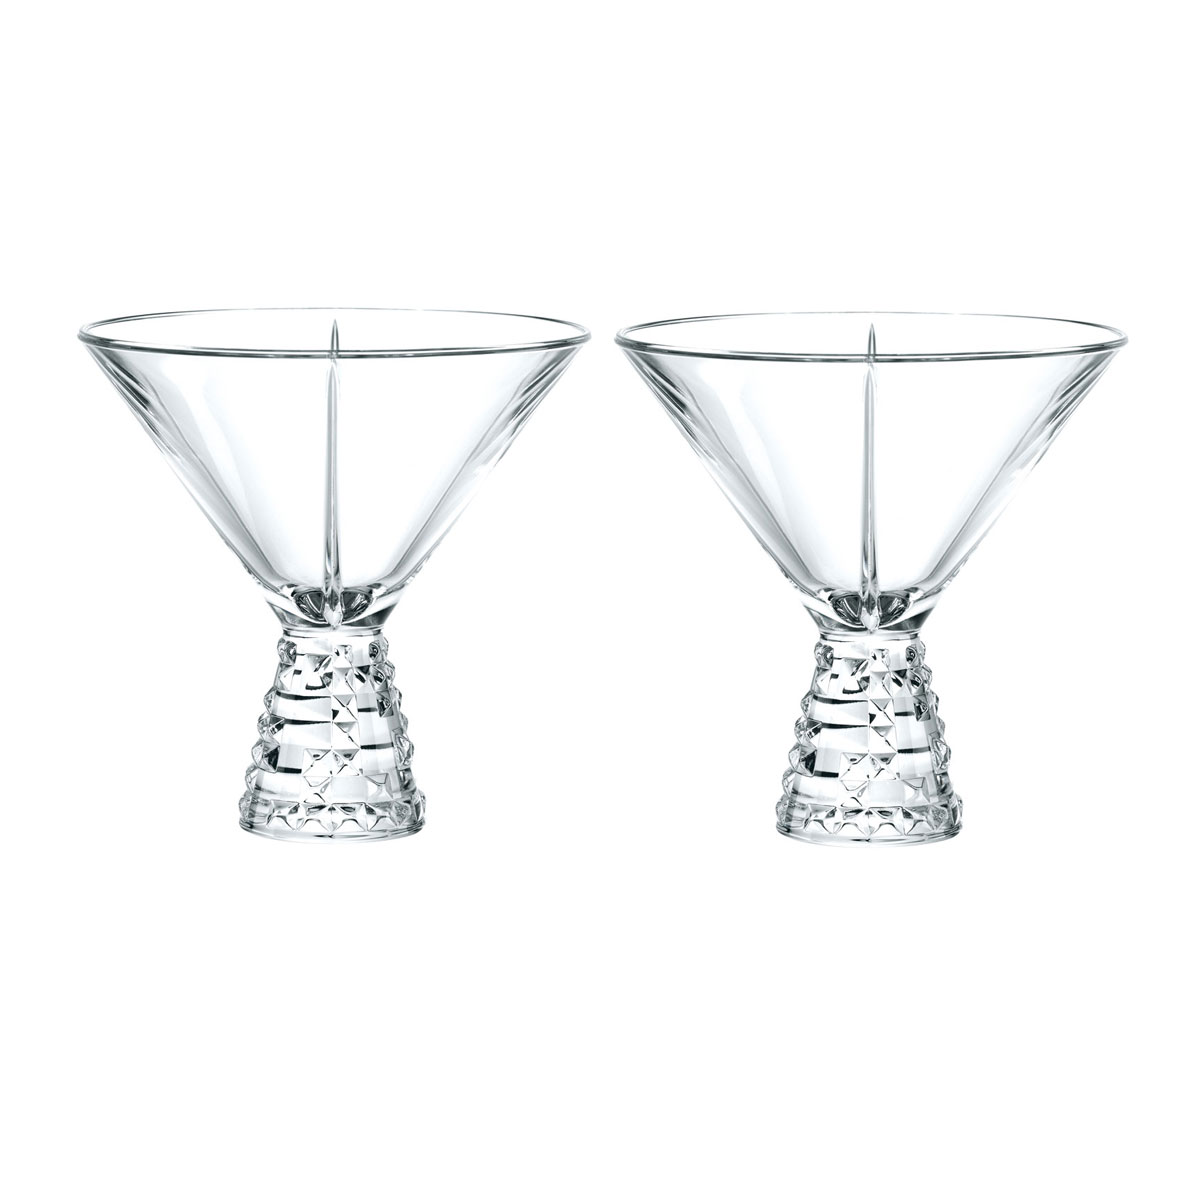 Nachtmann Punk Cocktail, Martini Glasses, Pair